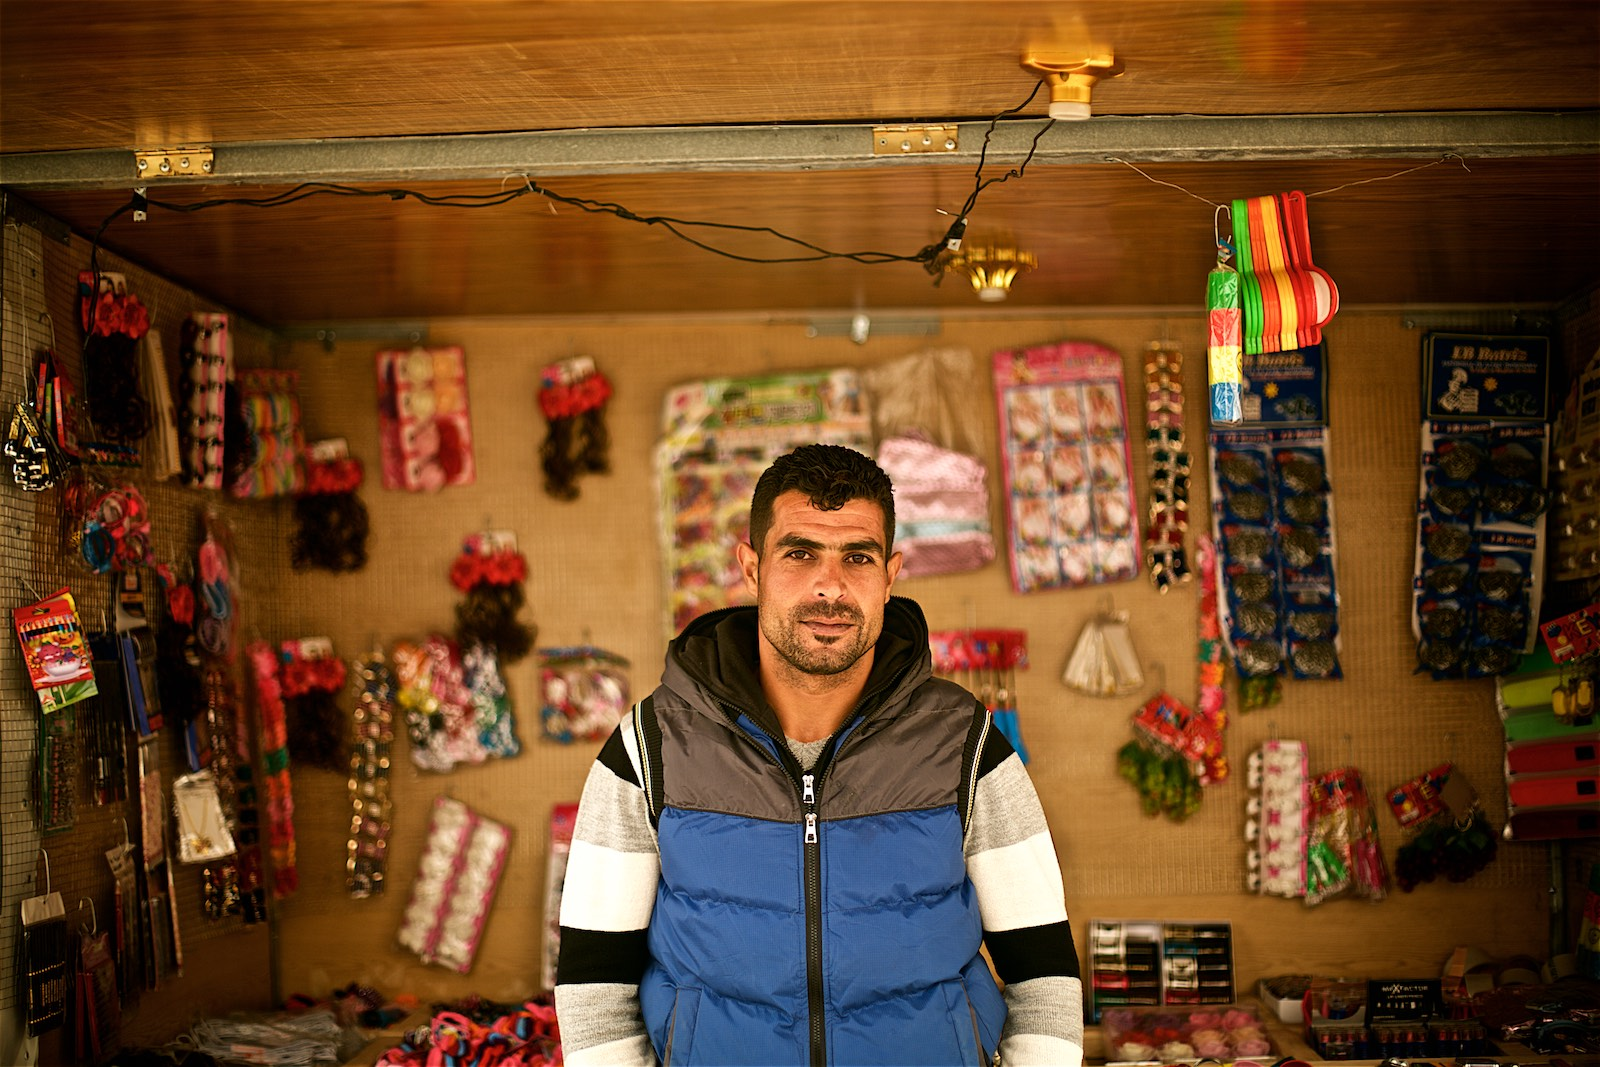 denis-bosnic-zaatari-jordan-refugee-camp-24.jpg